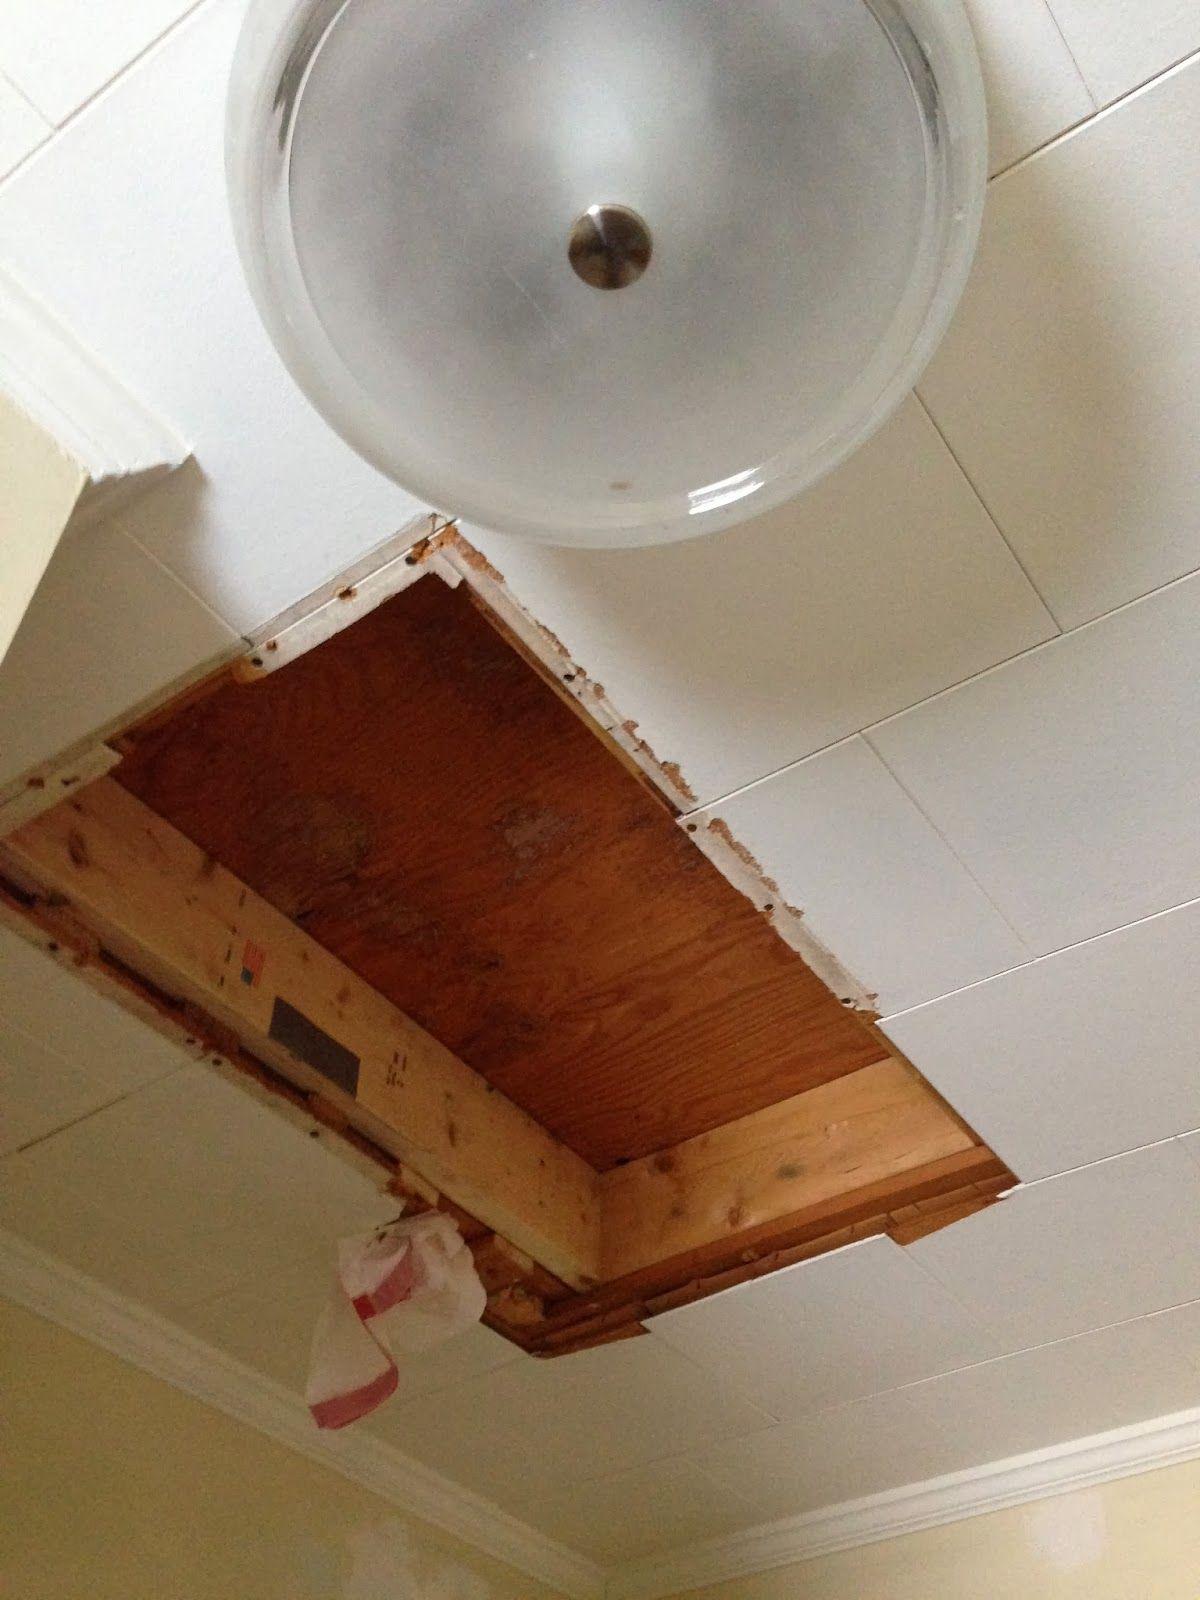 How To Install Bathroom Heater Fan